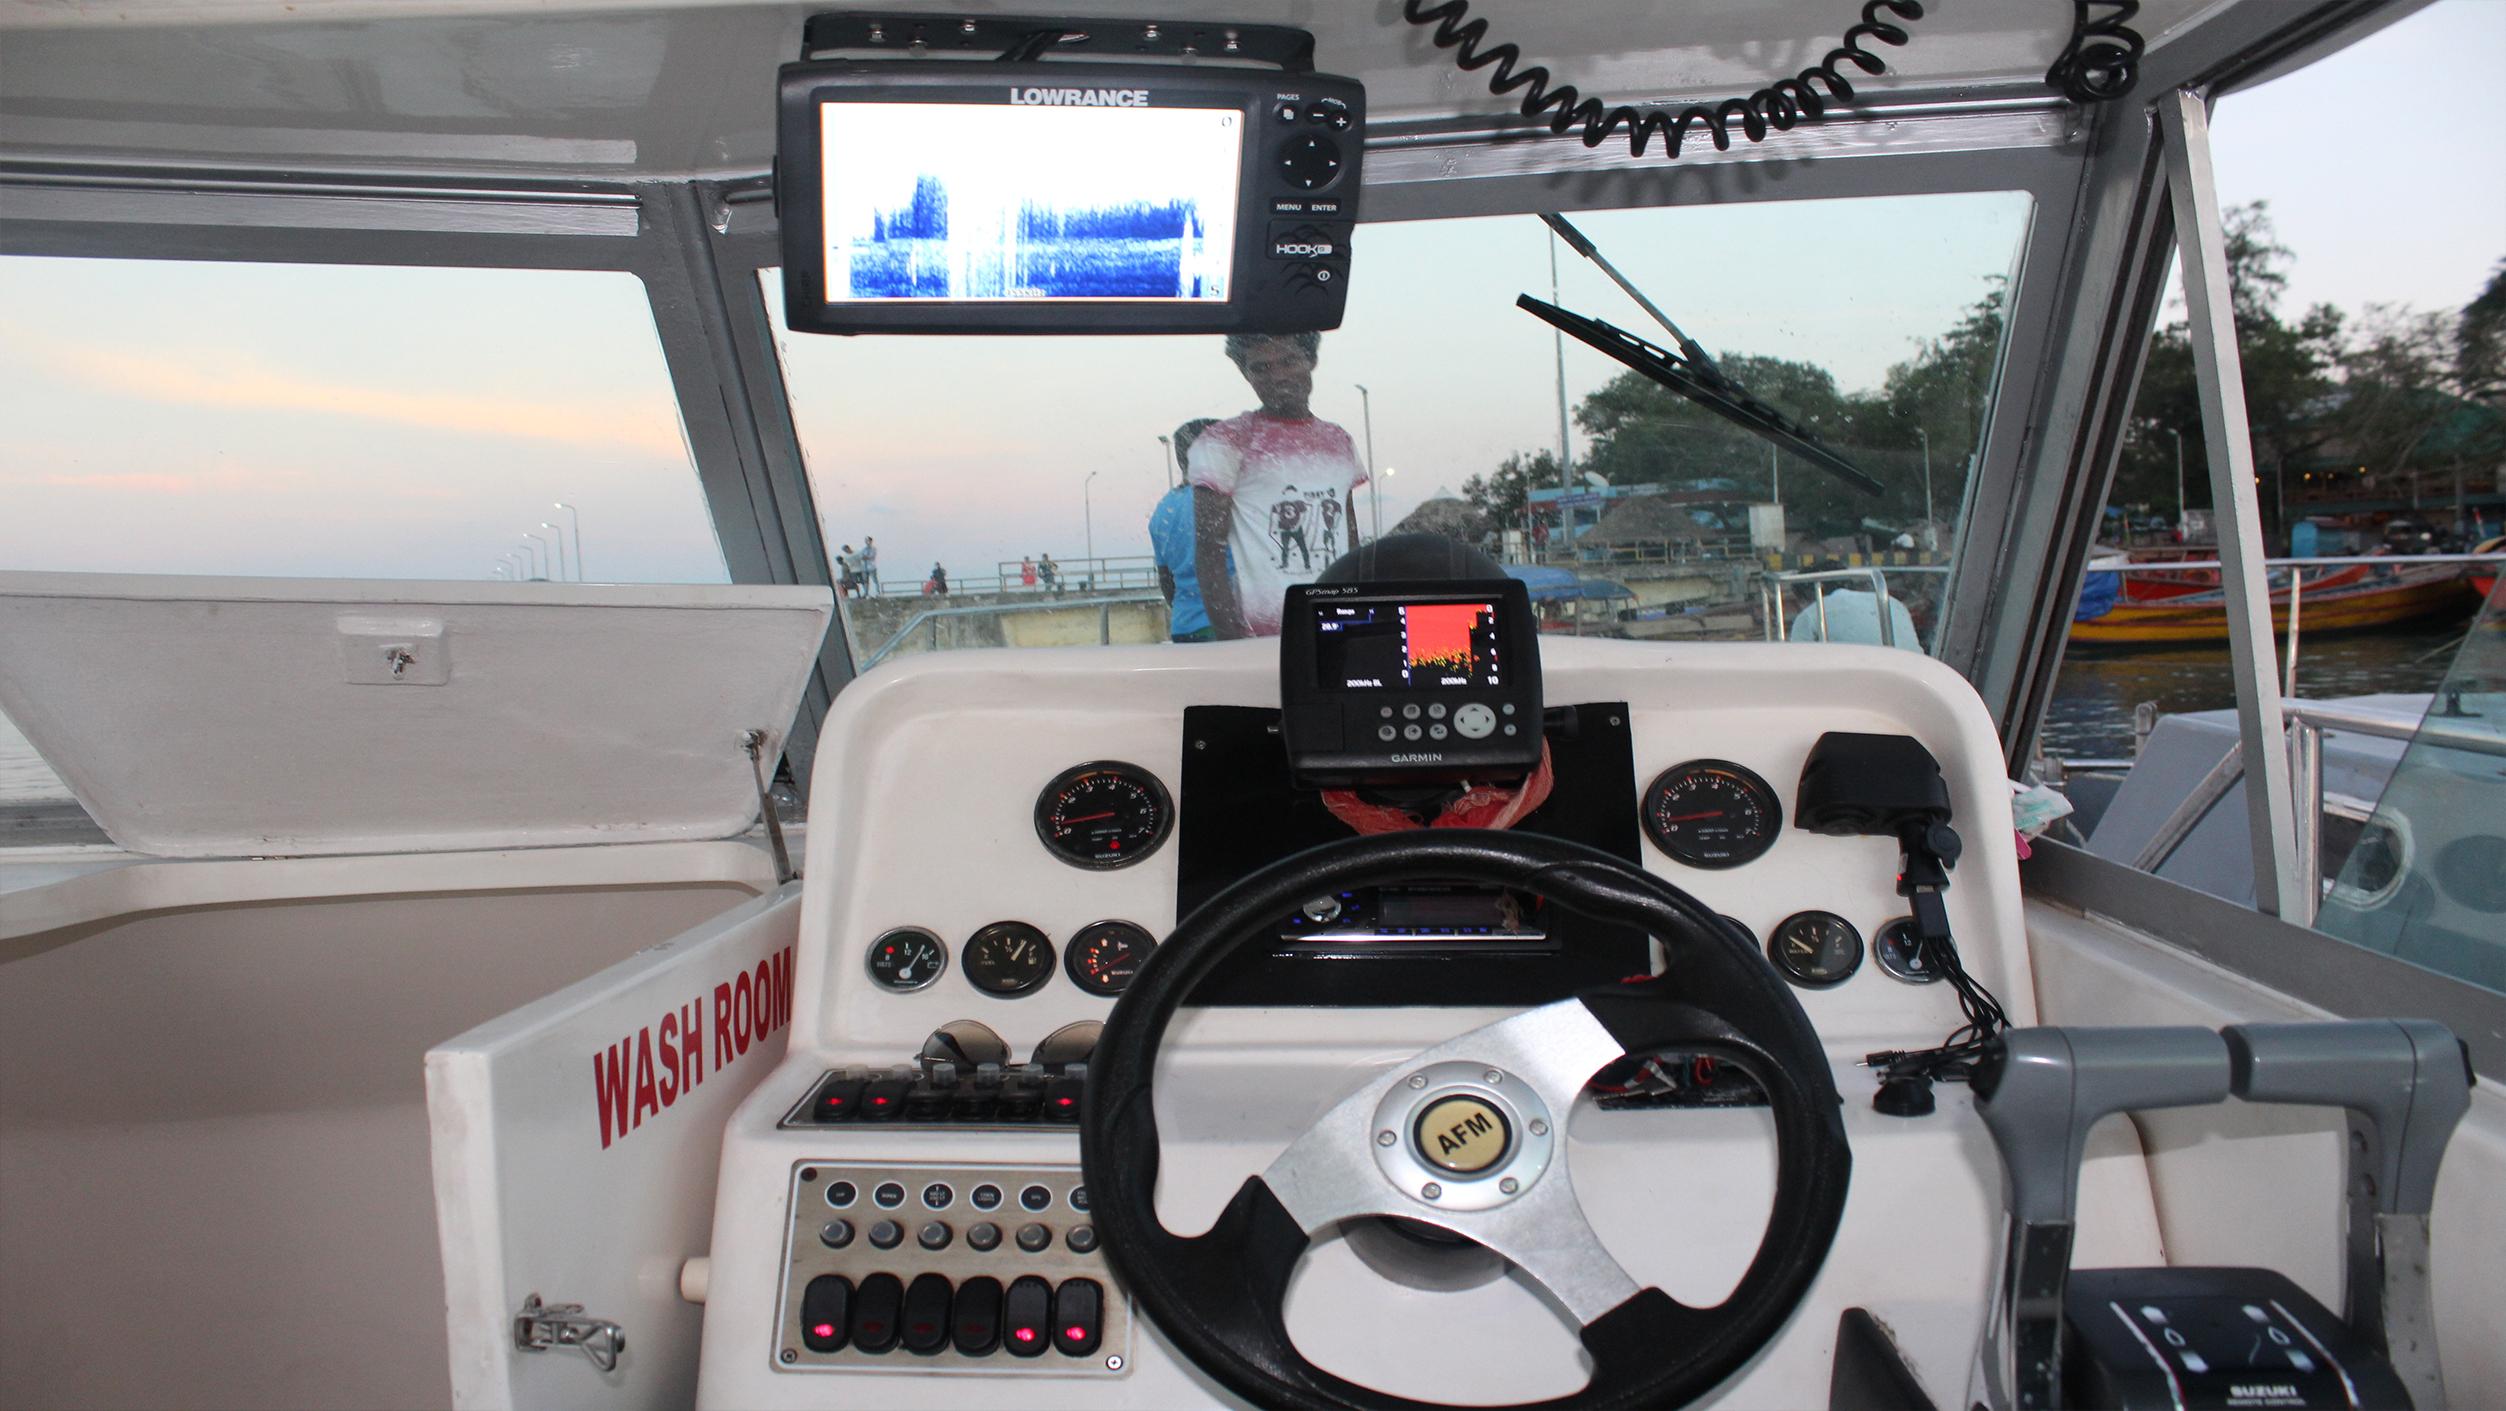 MFV Caiman fishing boat in india 2